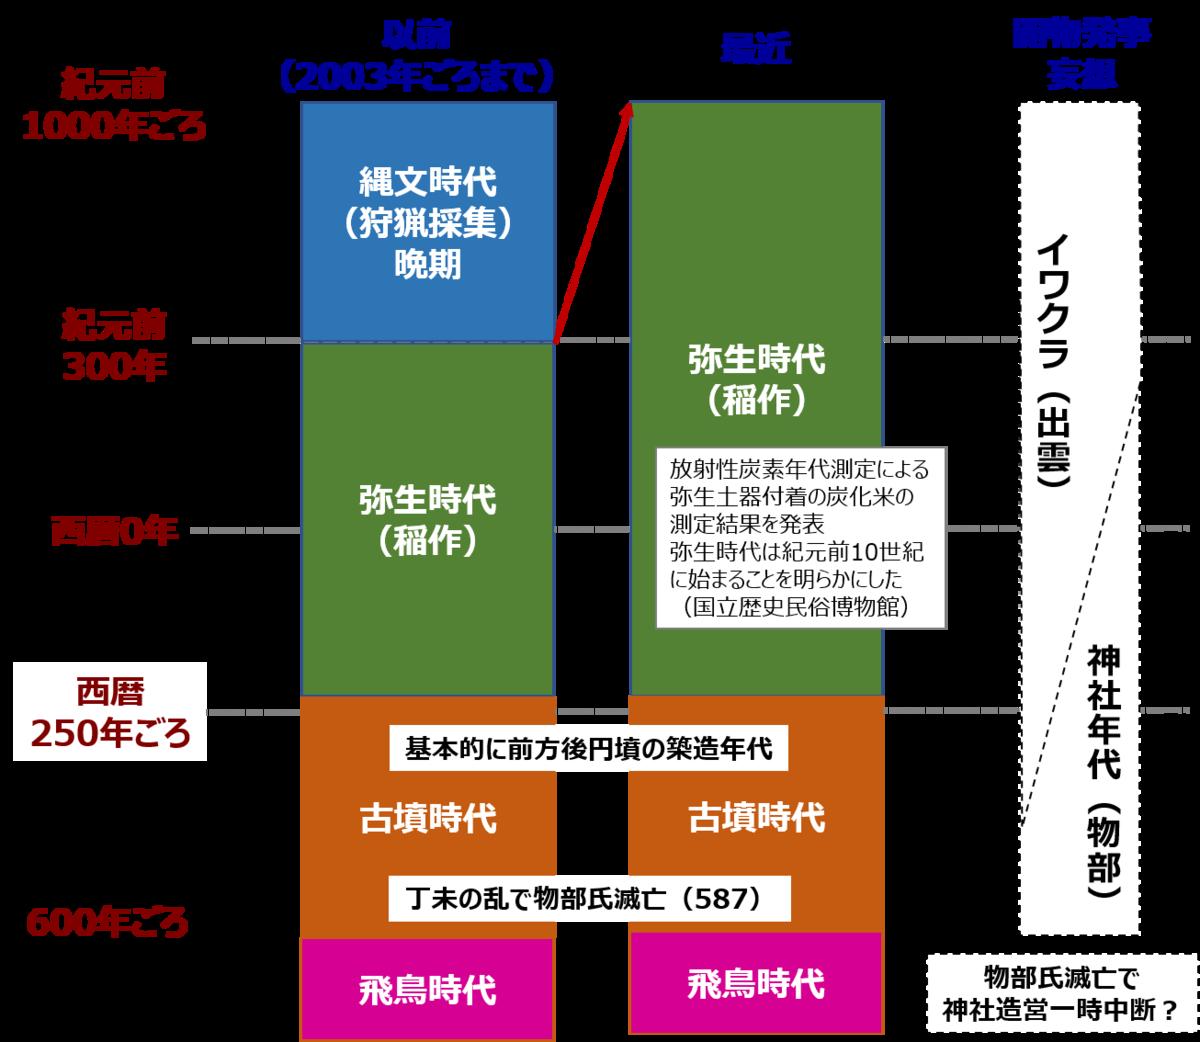 f:id:Kaimotu_Hatuji:20190811184314p:plain